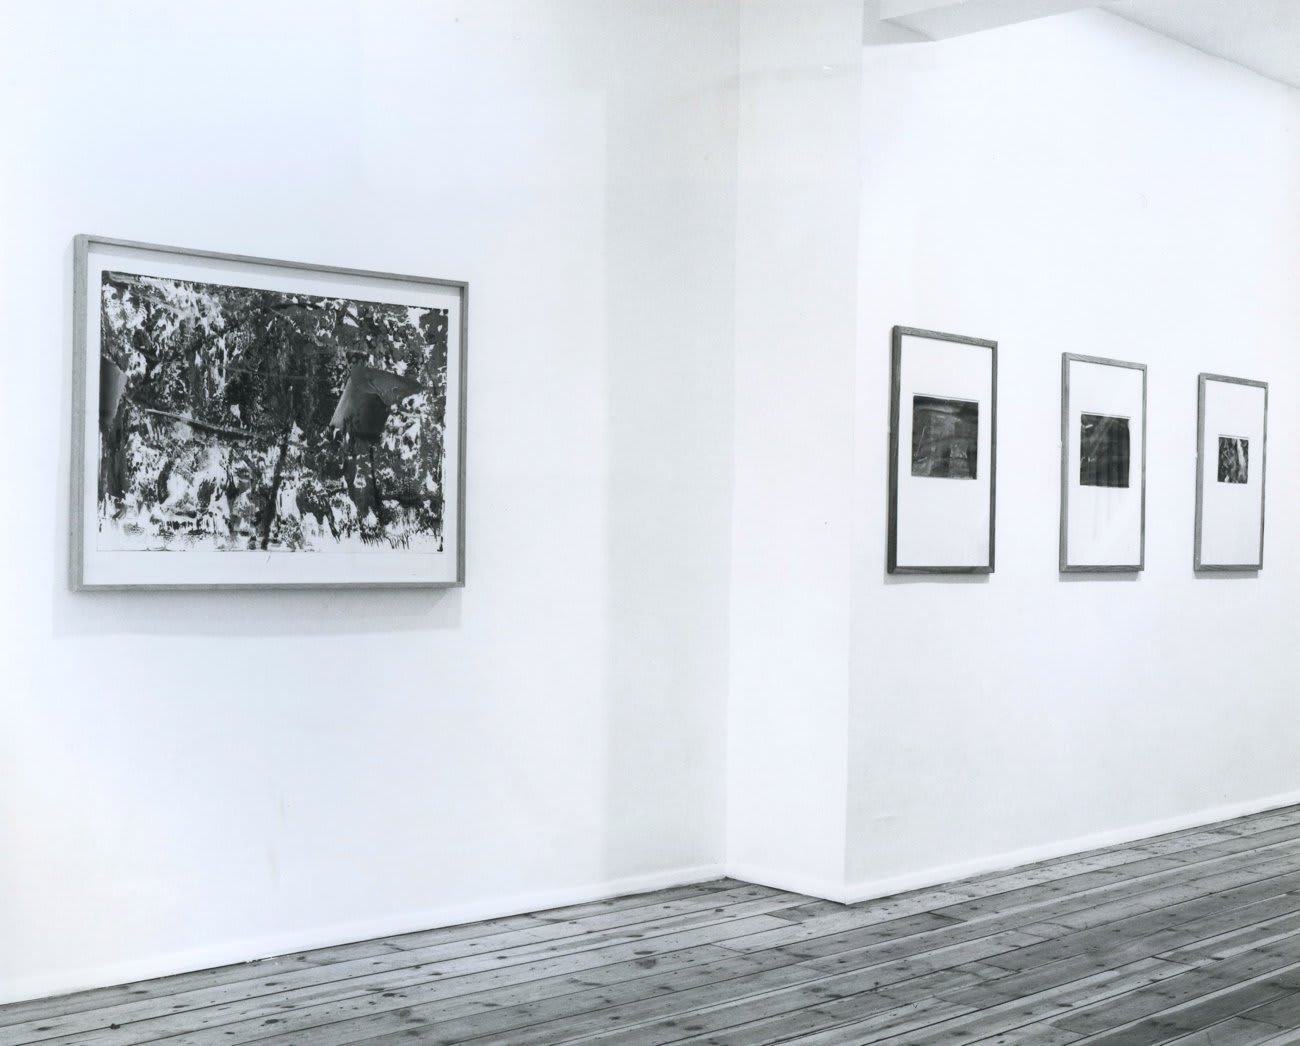 Gerhard Richter: Works on Paper, installation view, July 1987